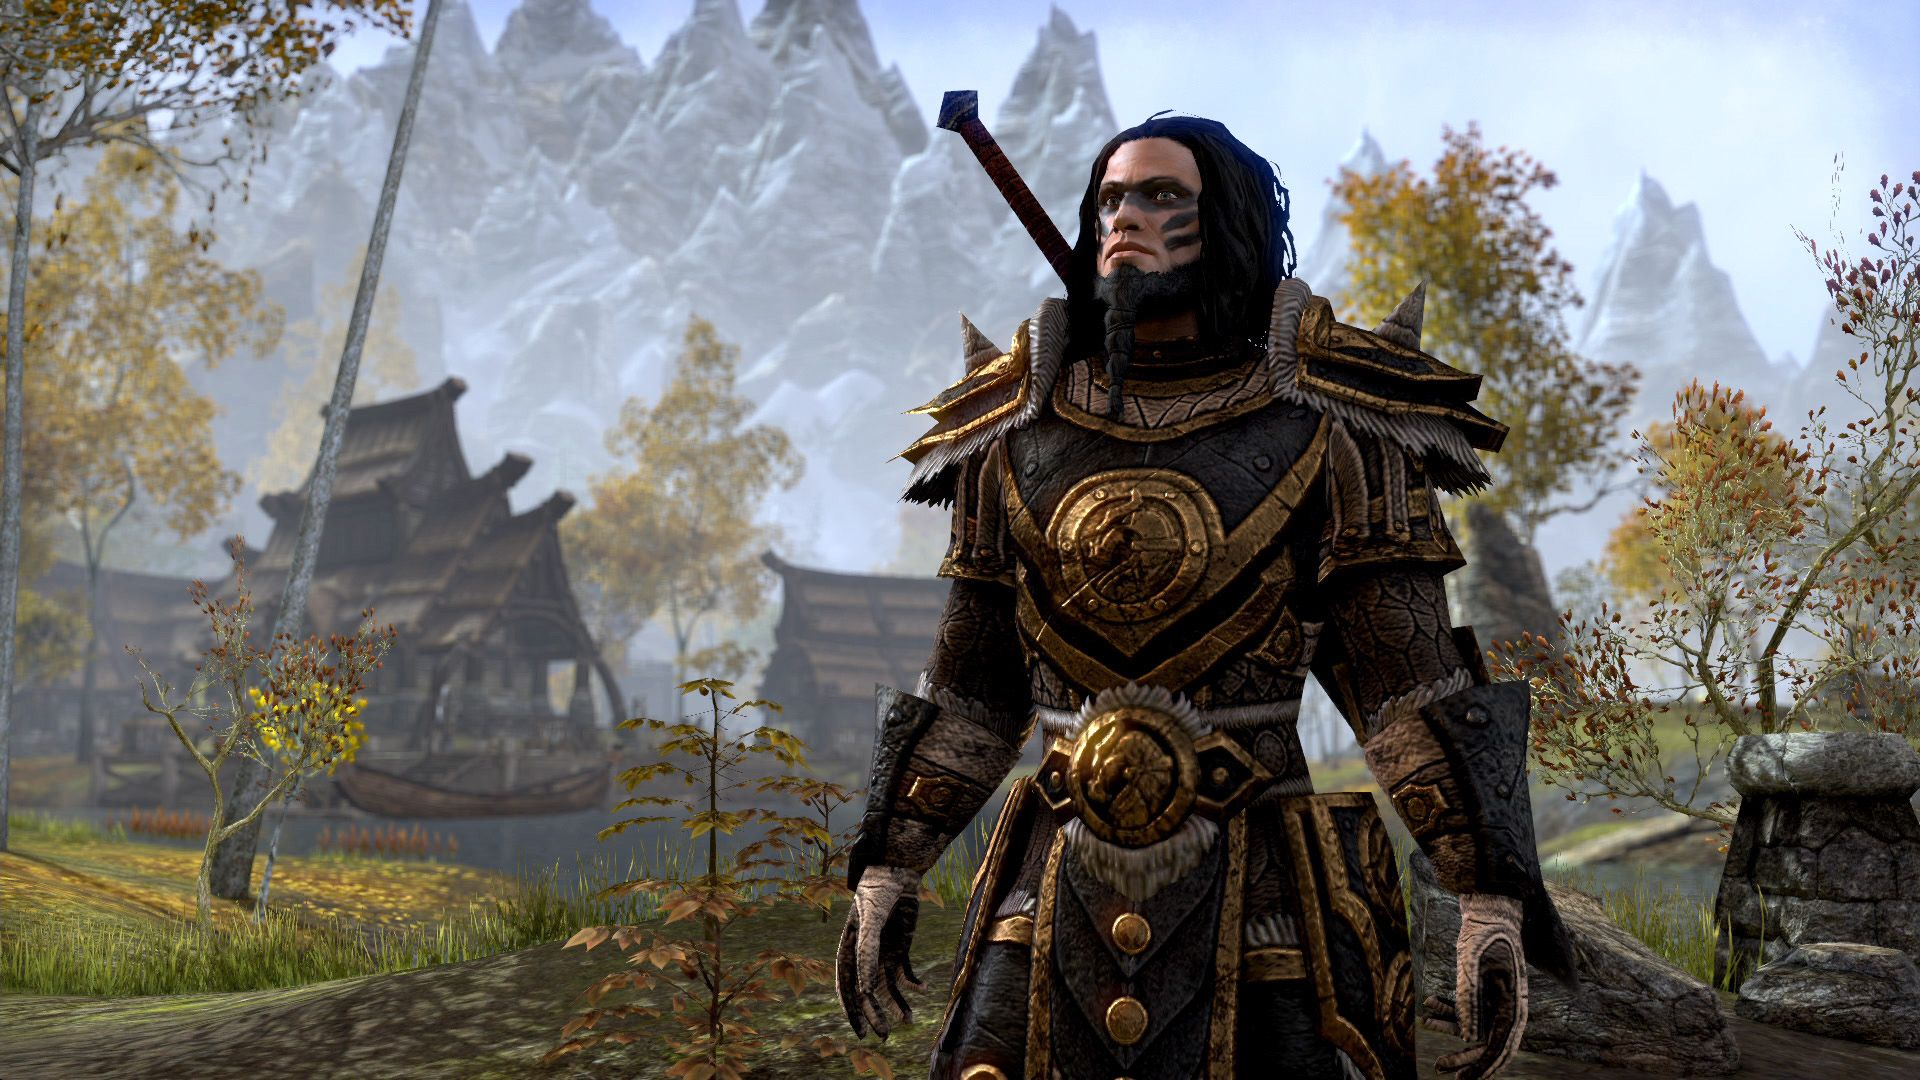 elder scrolls online orc armor - Google Search